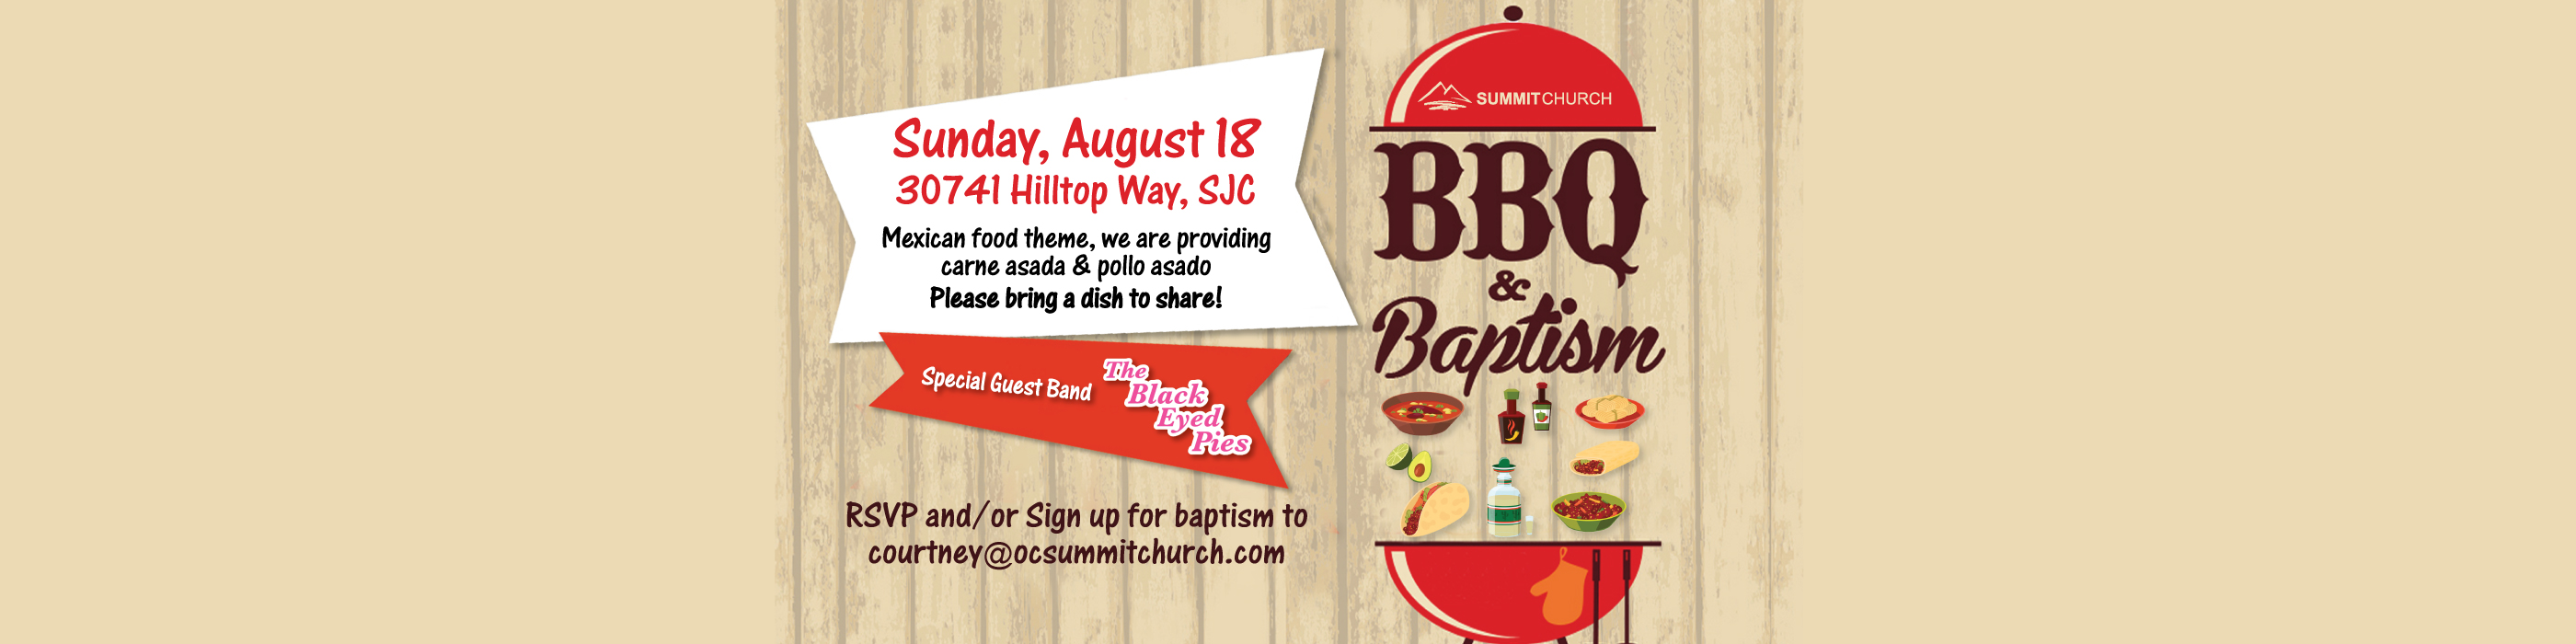 Baptisim-BBQ-081819-WEB-2800x700